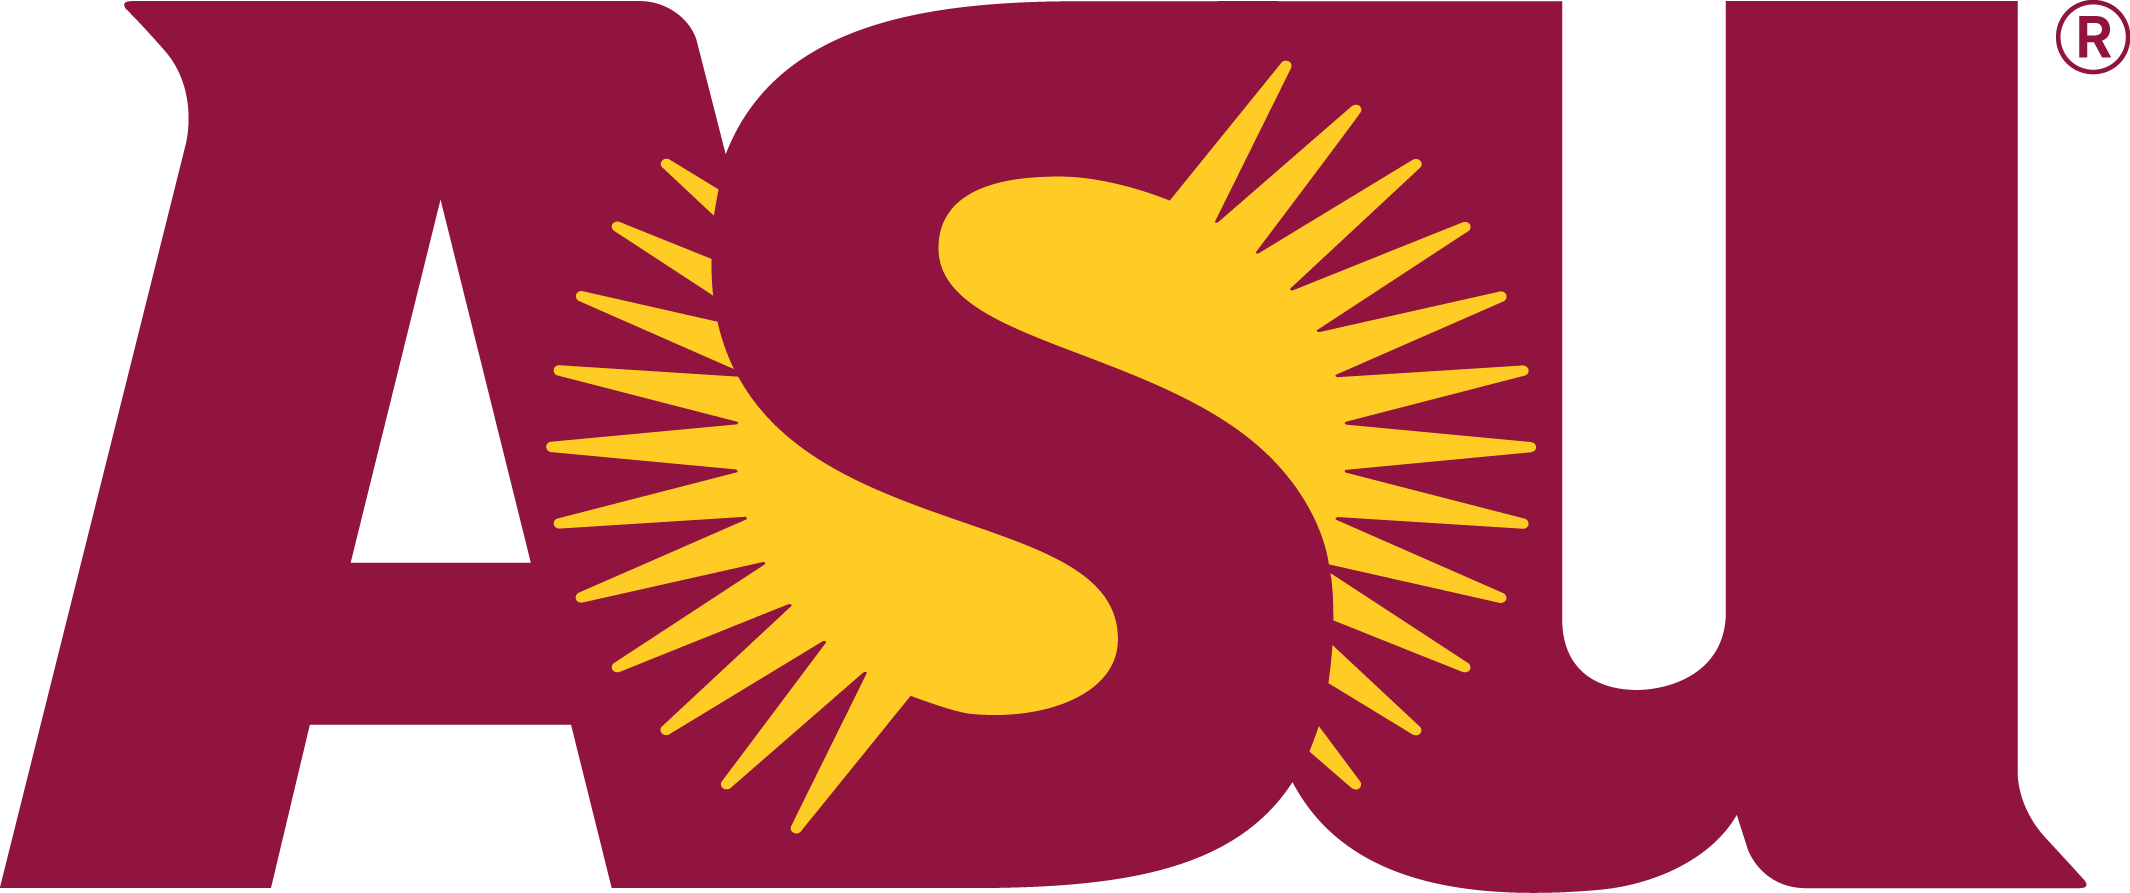 ASU-logo_Arizona-State-University